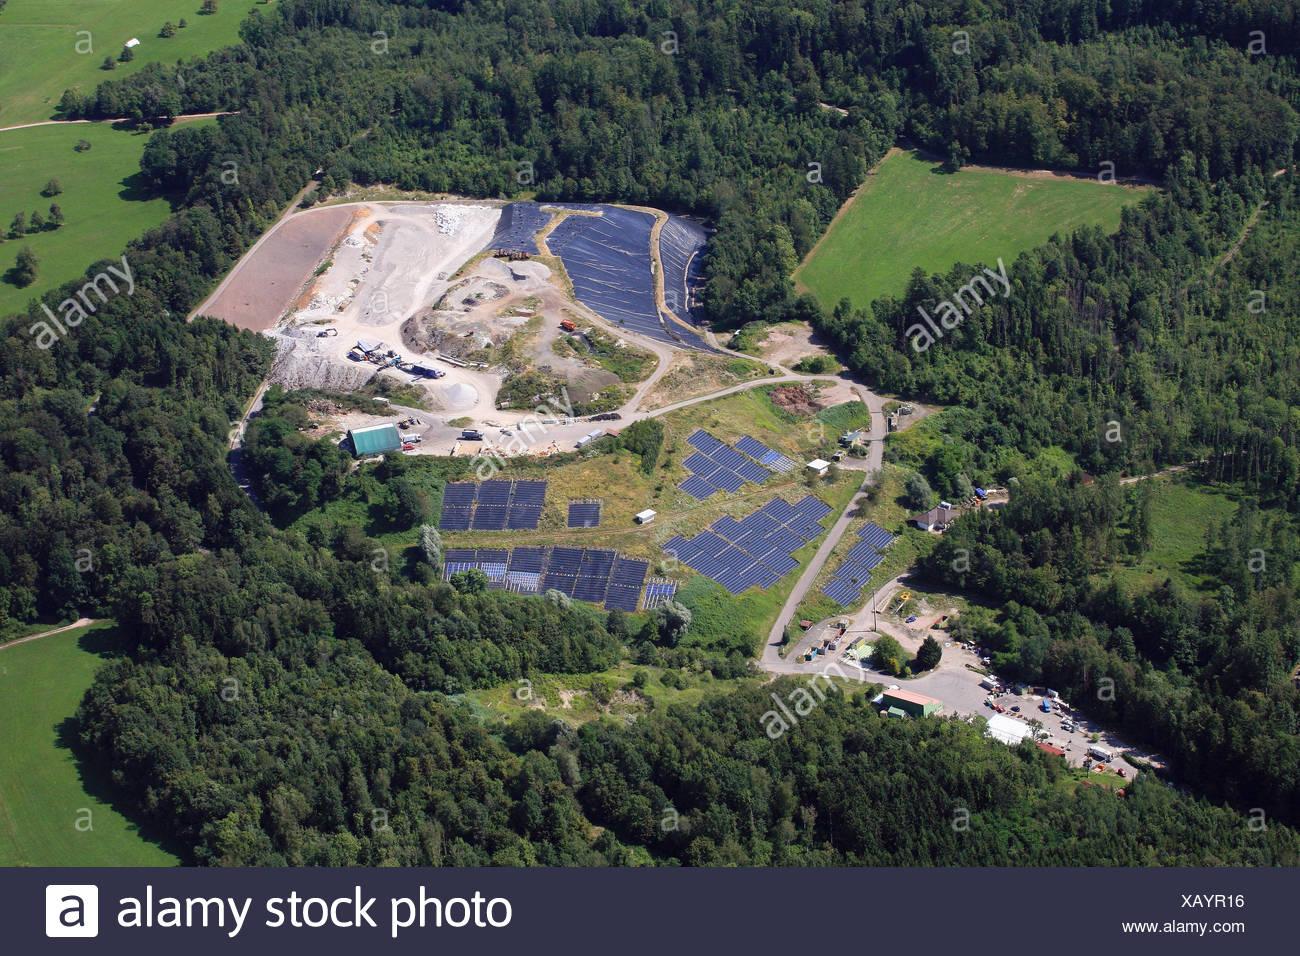 Typically sanitary landfill Lachengraben - Stock Image